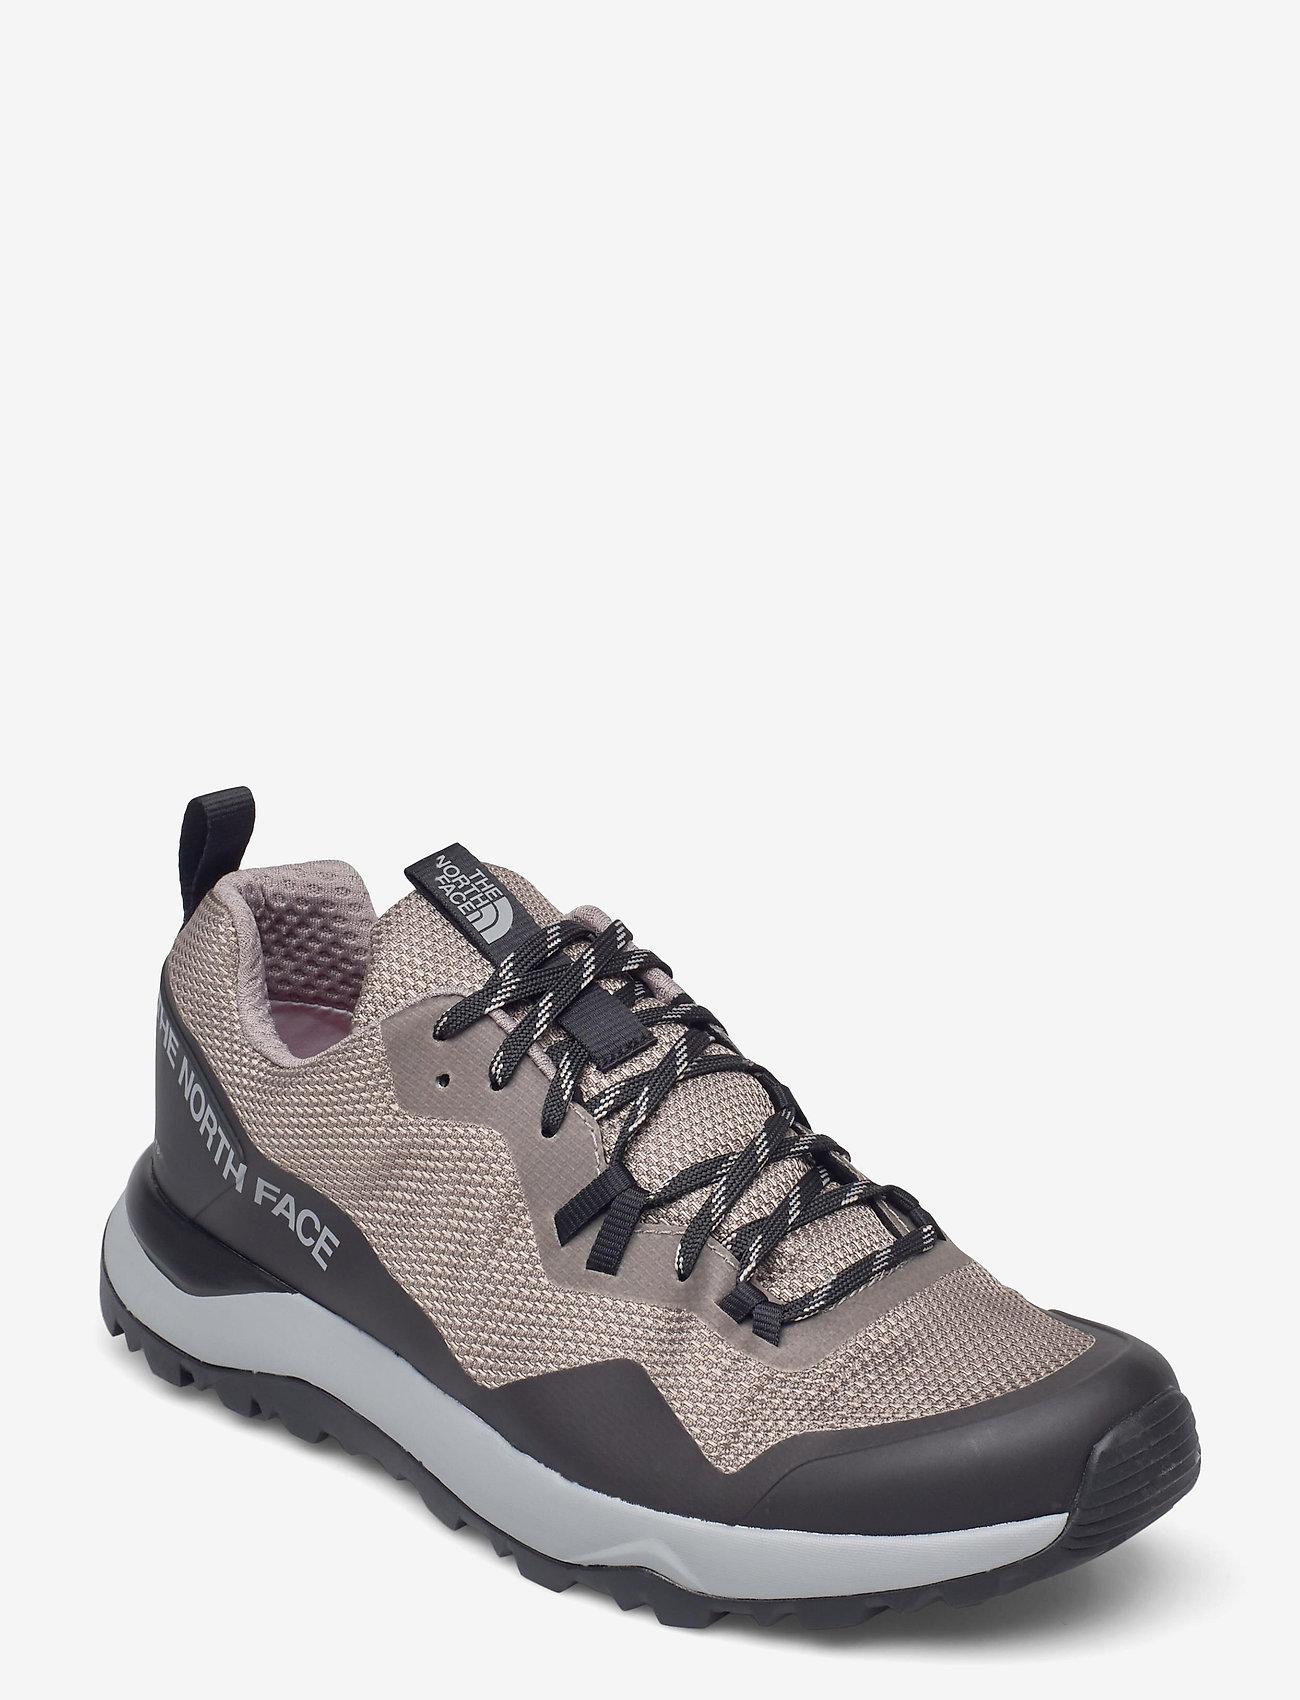 The North Face - M ACTIVIST FUTRLIGHT - chaussures de randonnée - mineral grey/tnf black - 0